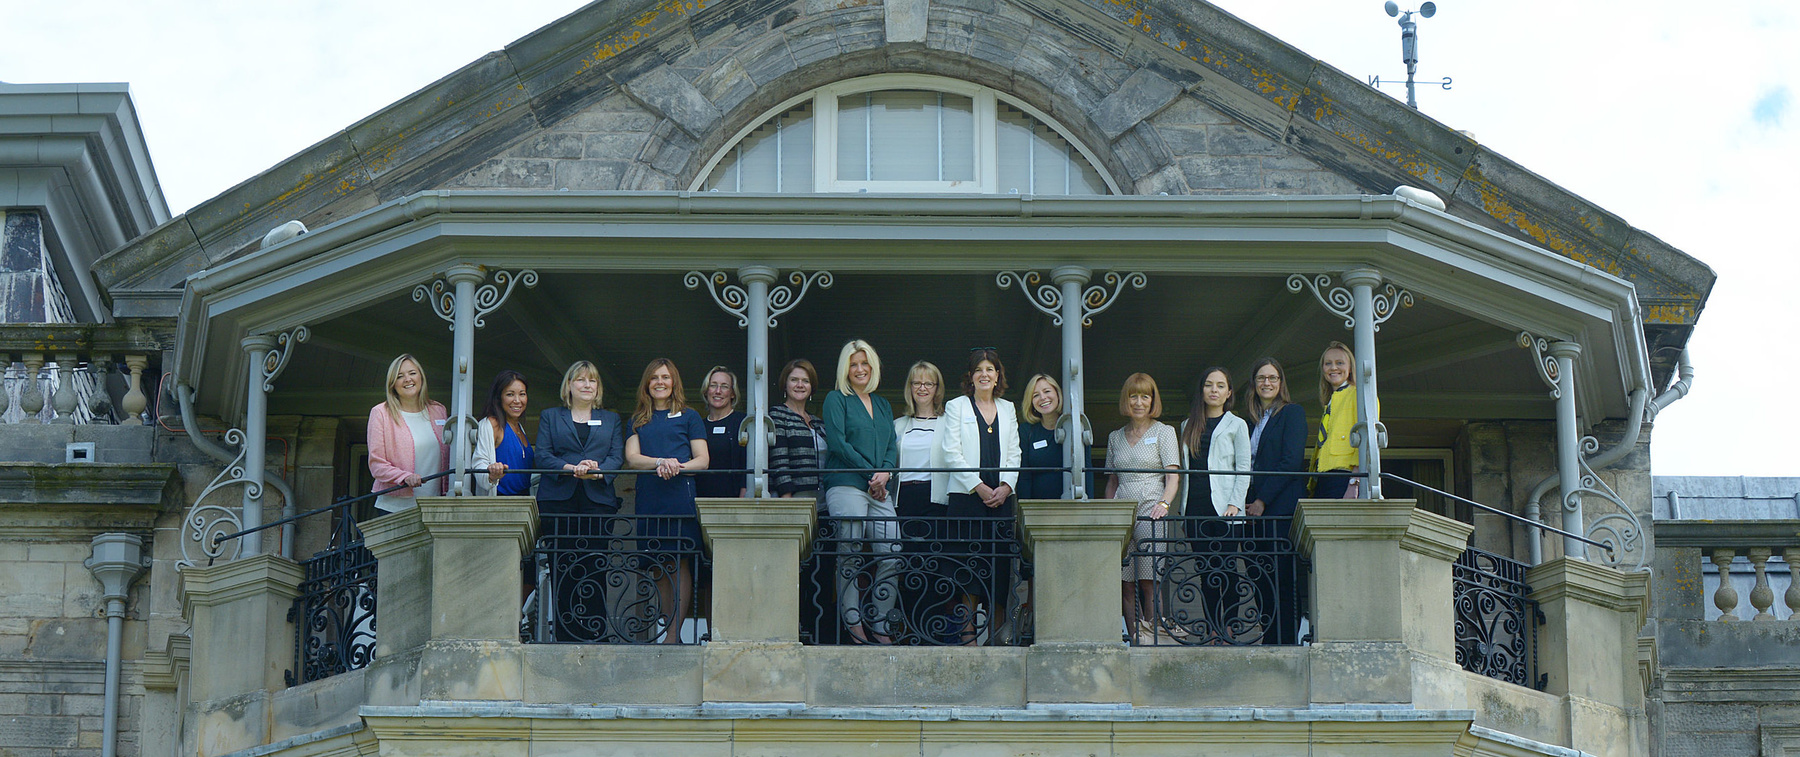 Women's summit Balcony